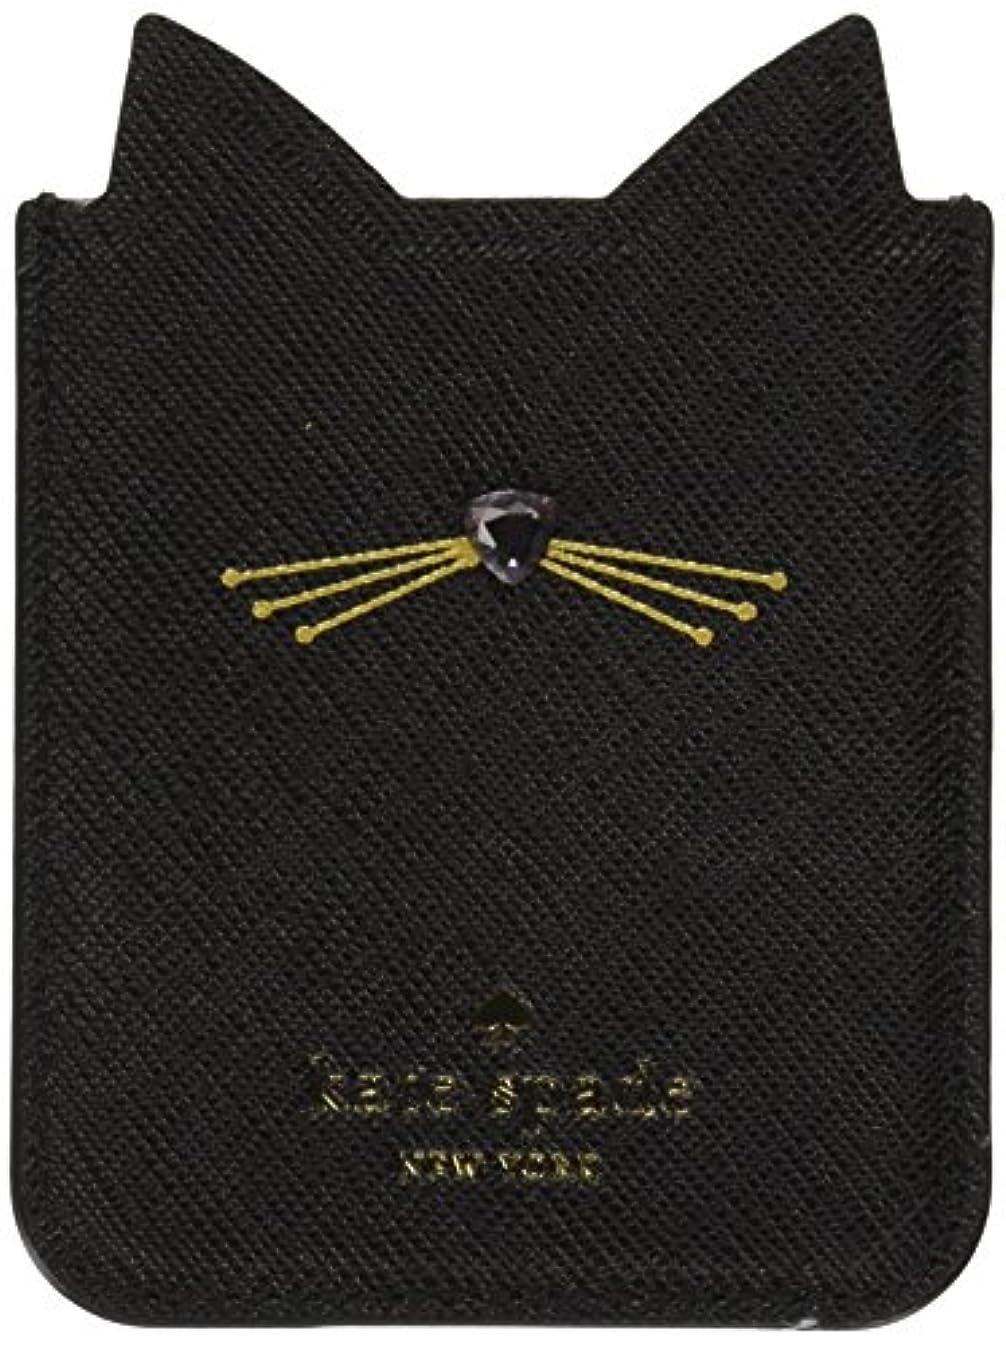 Kate Spade New York Embellished Cat Adhesive Phone Pocket, Black, One Size